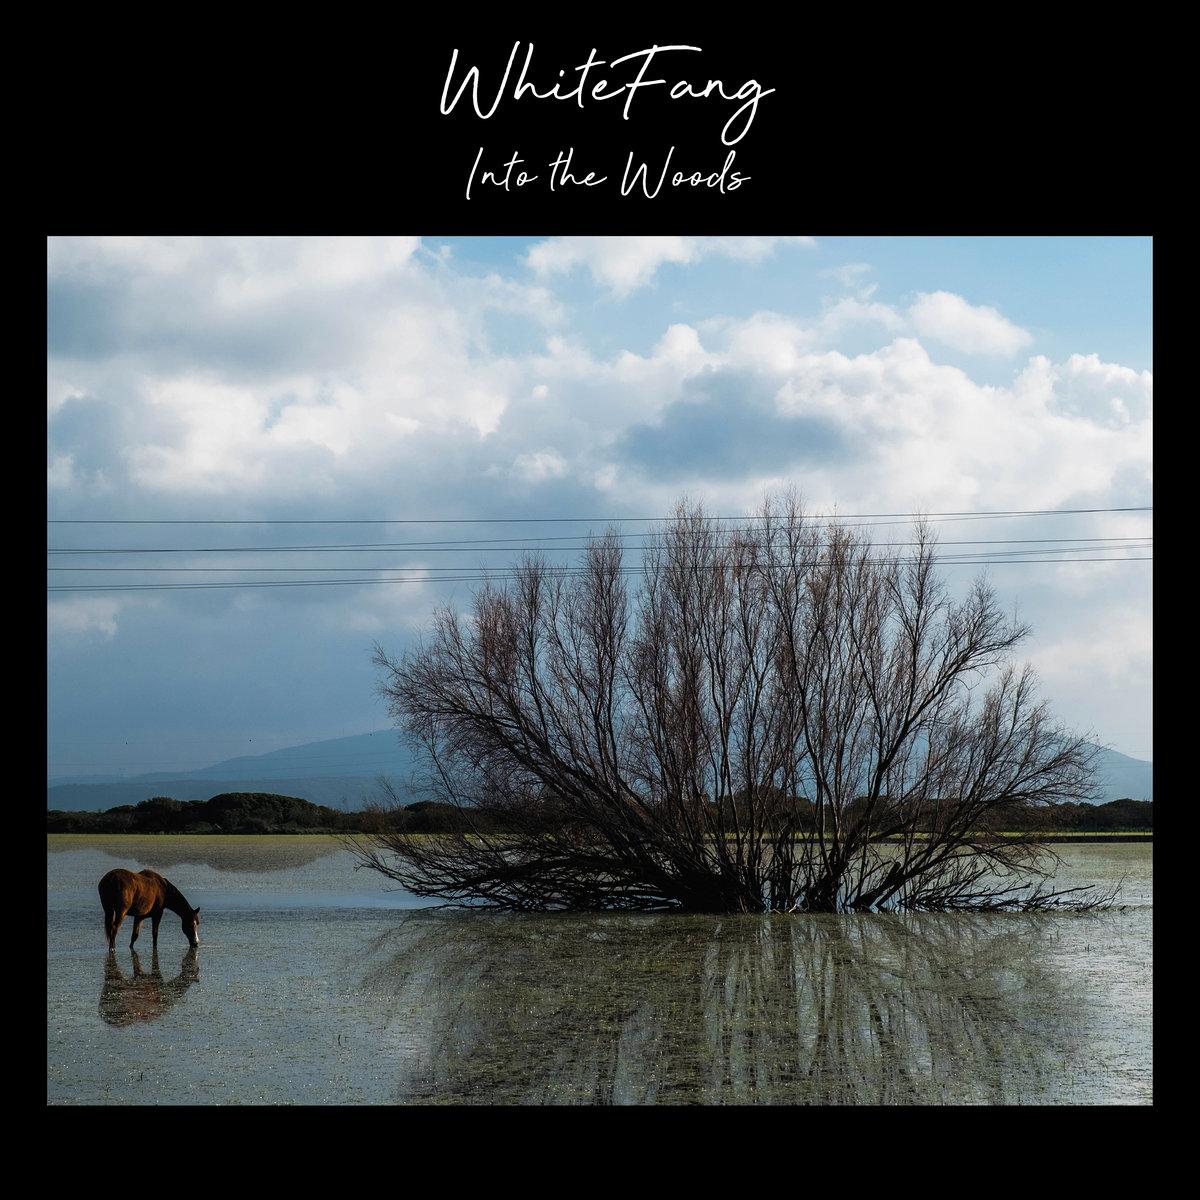 WhiteFang - Into The Woods - Luca Cadeddu Palmas - Talk About Records - Bandcamp - 2021 - Sa Scena - 15 gennaio 2021